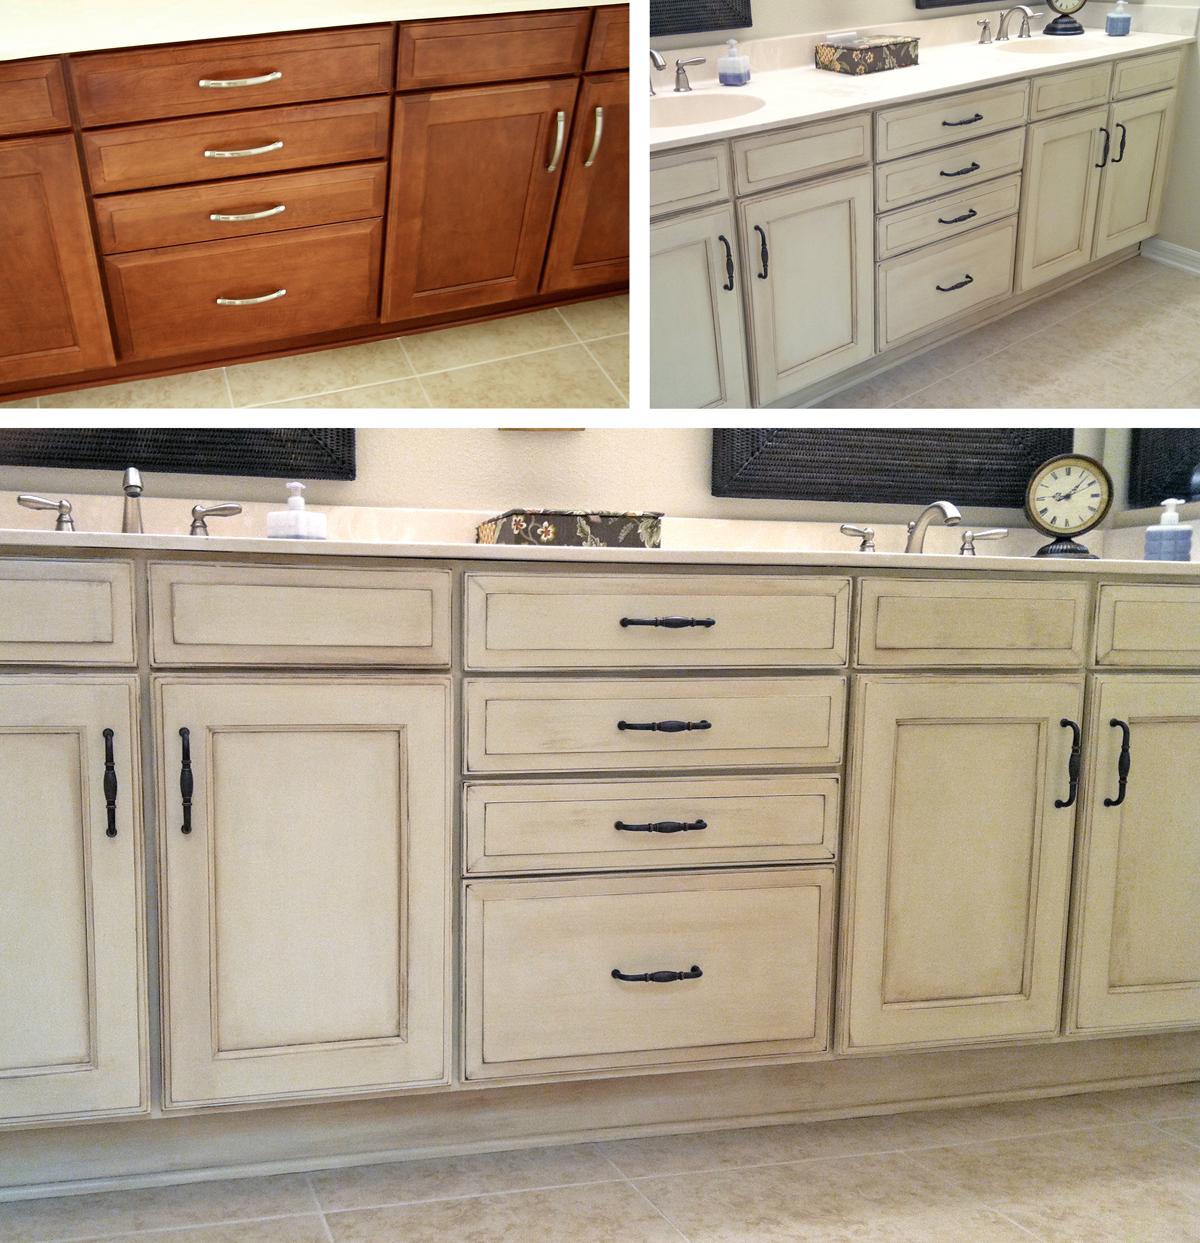 Kitchen Island And Chalk Paint Kitchen Cabinets Before And After Chalk Paint Kitchen Cabinets Chalk Paint Kitchen Painting Cabinets